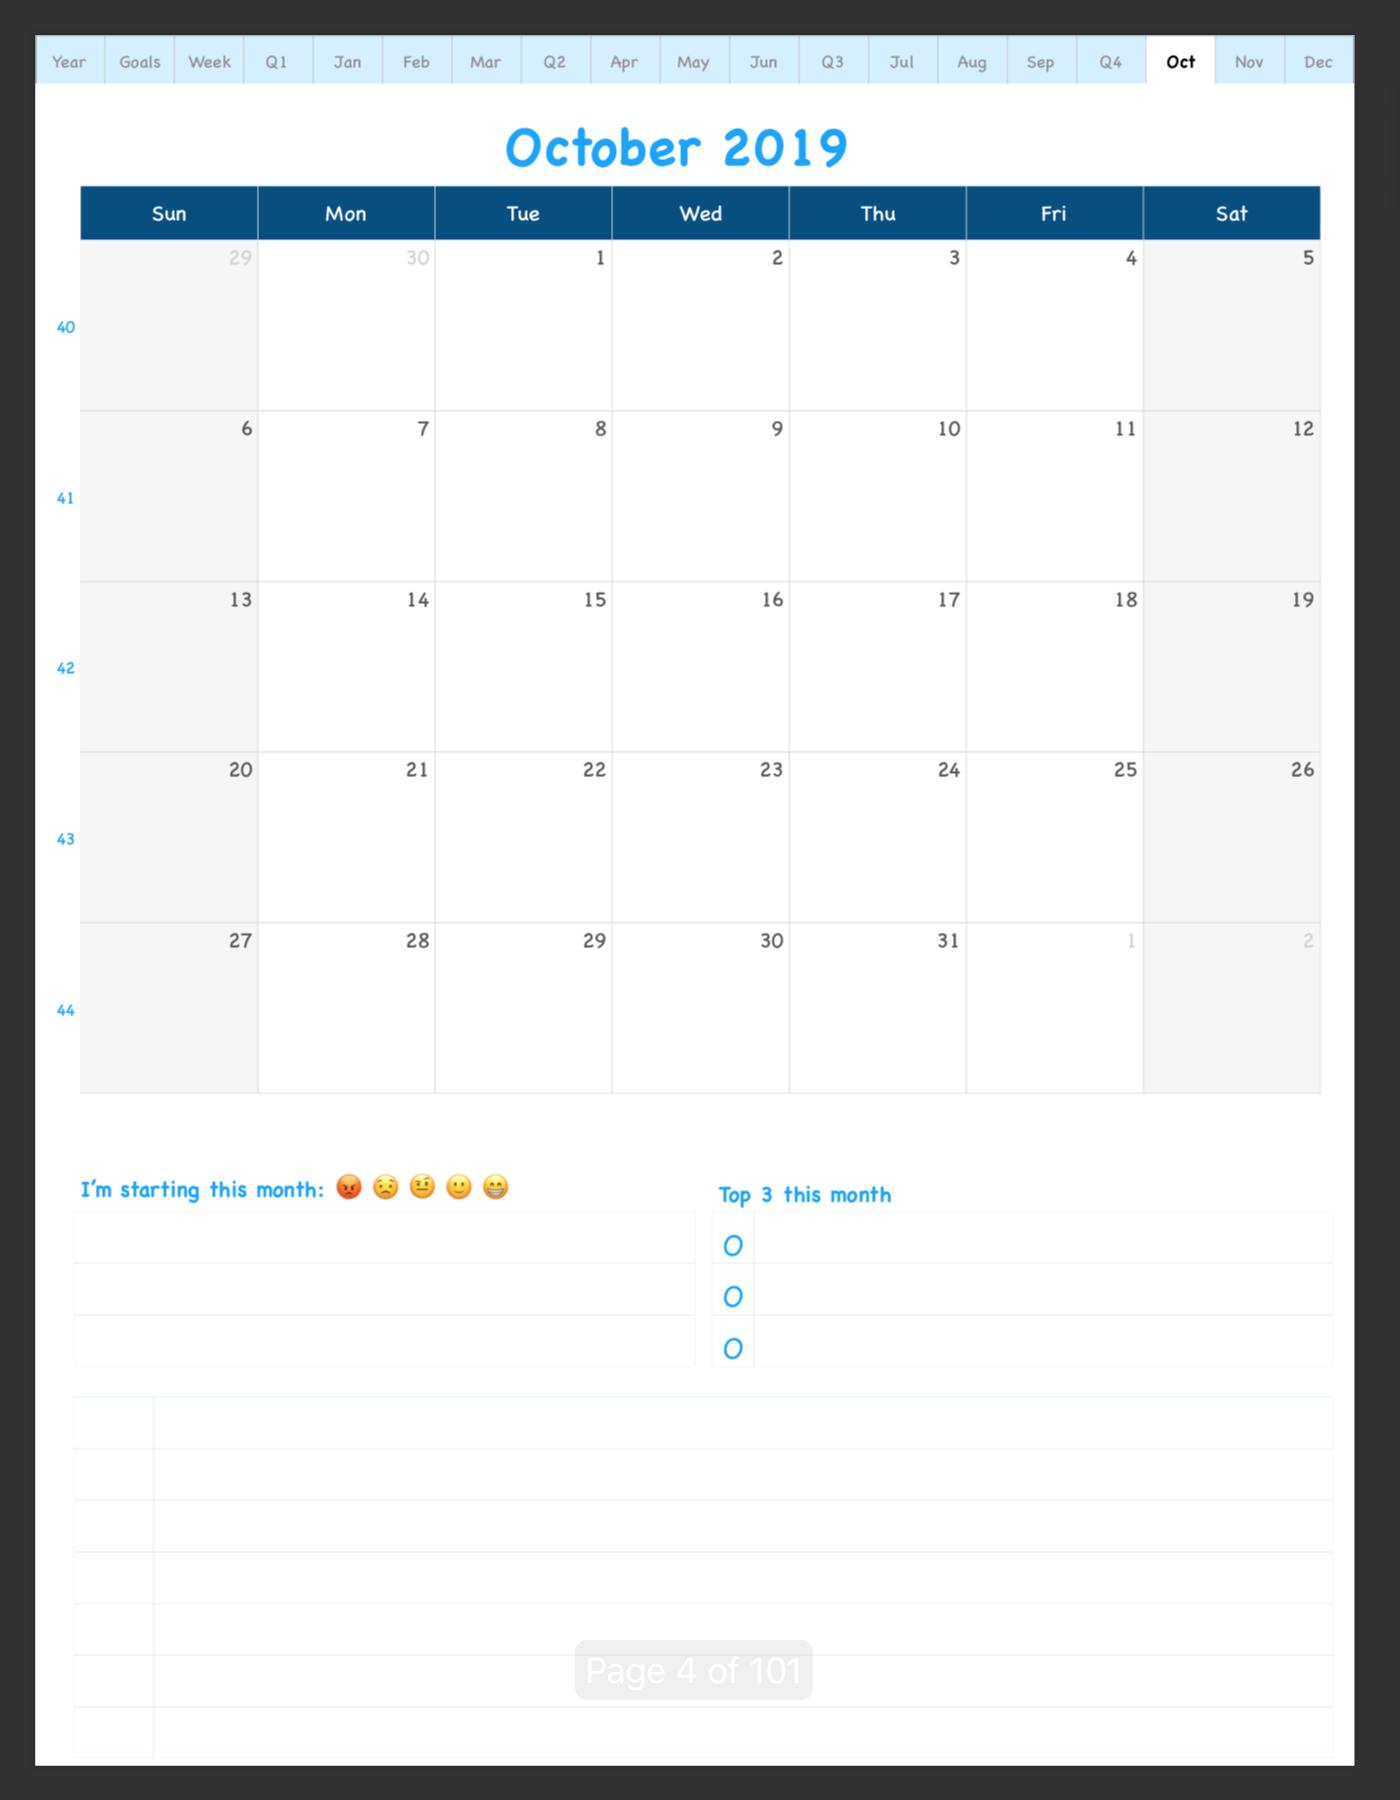 Screenshot 2019-10-01 11.35.26.png